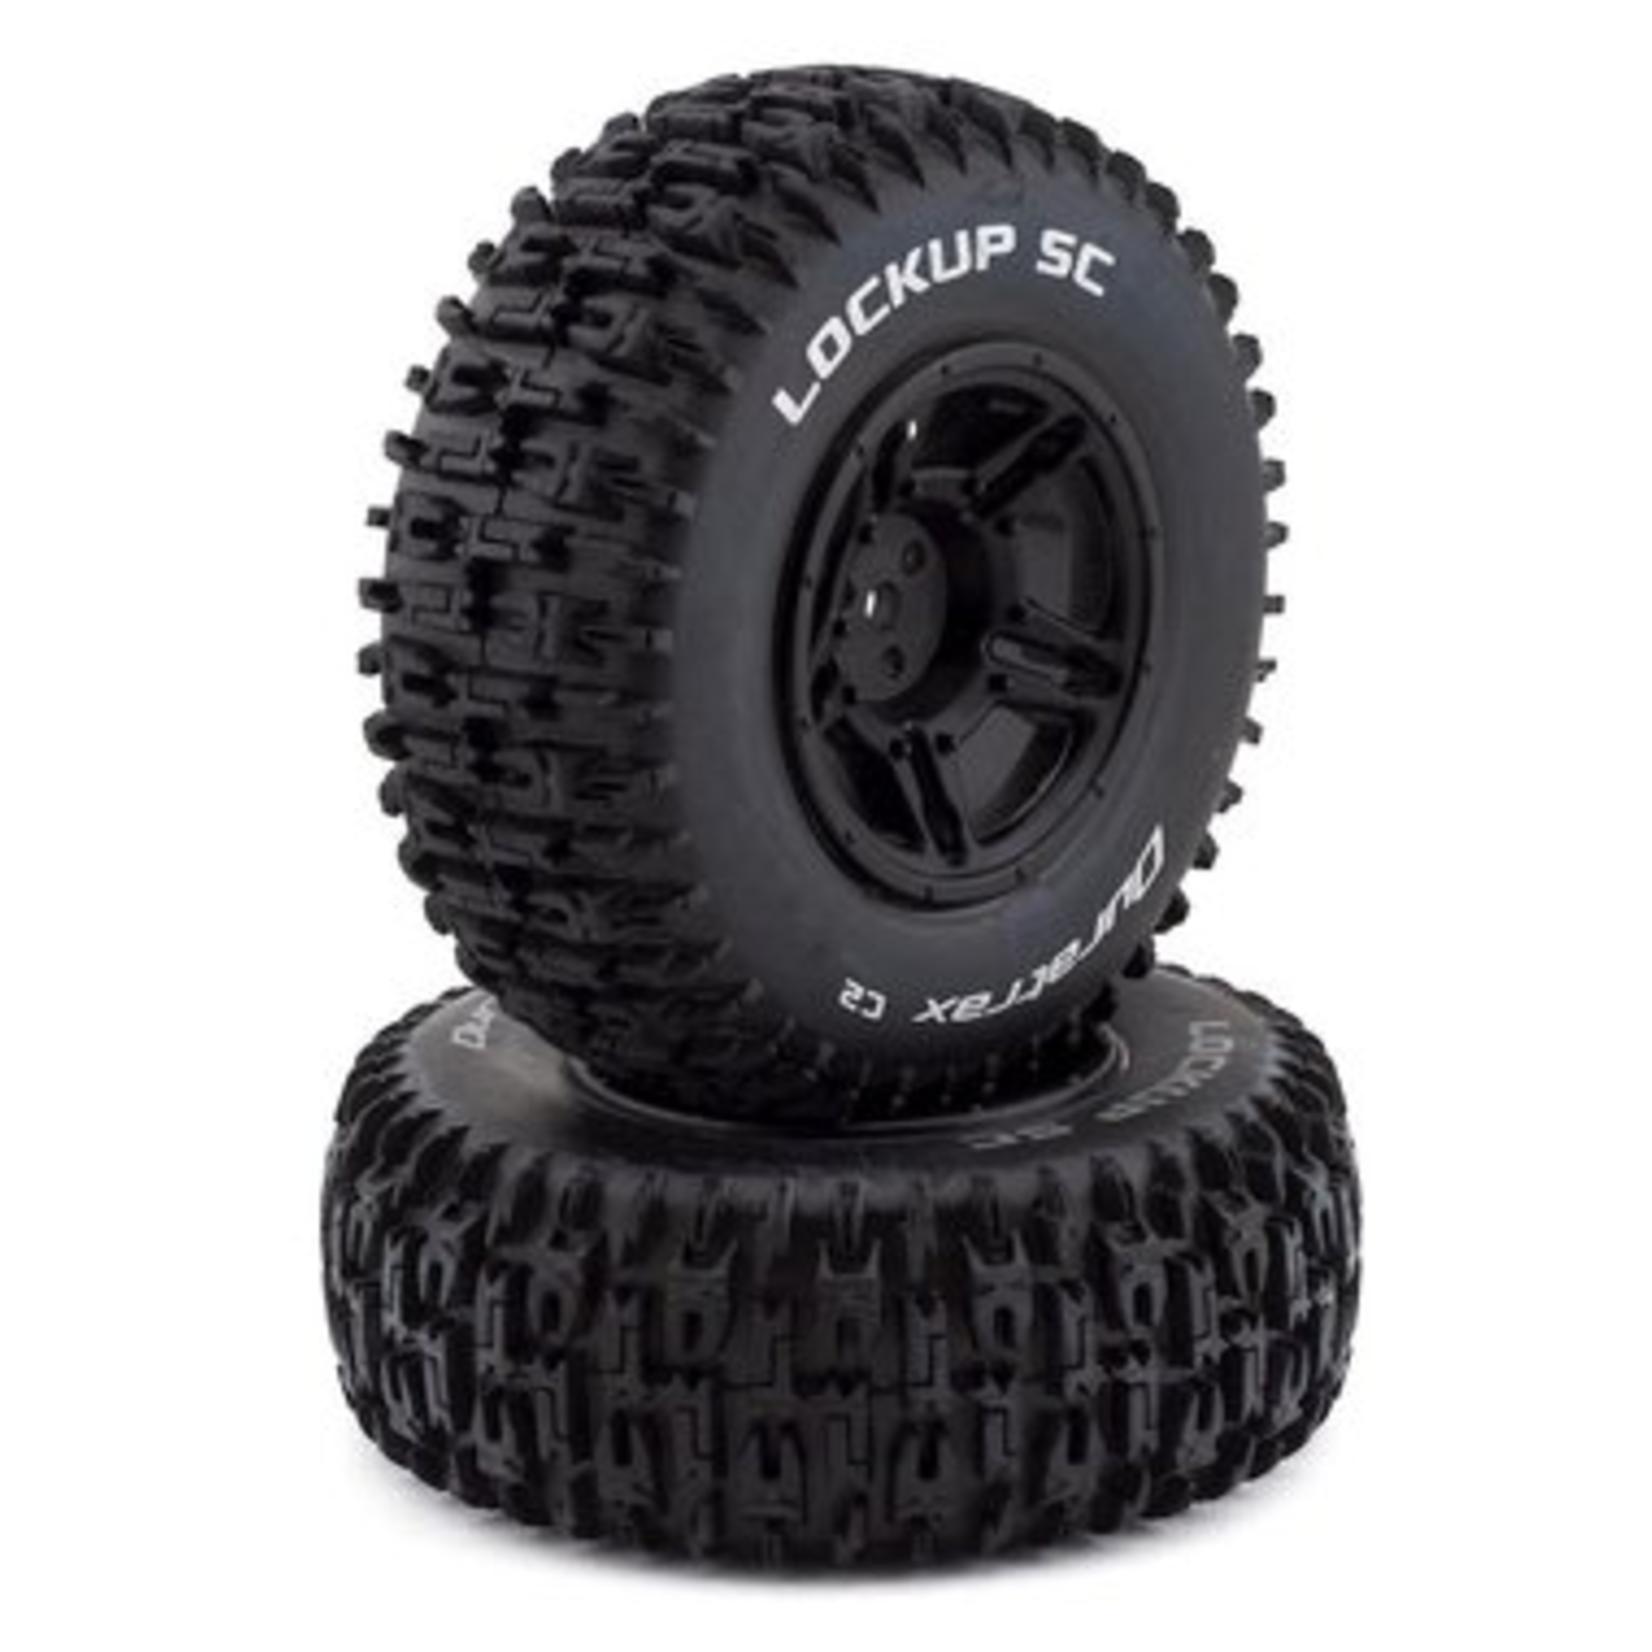 Duratrax DTXC3671 Duratrax Lockup SC Tire C2 Mounted Black Rear Slash (2)